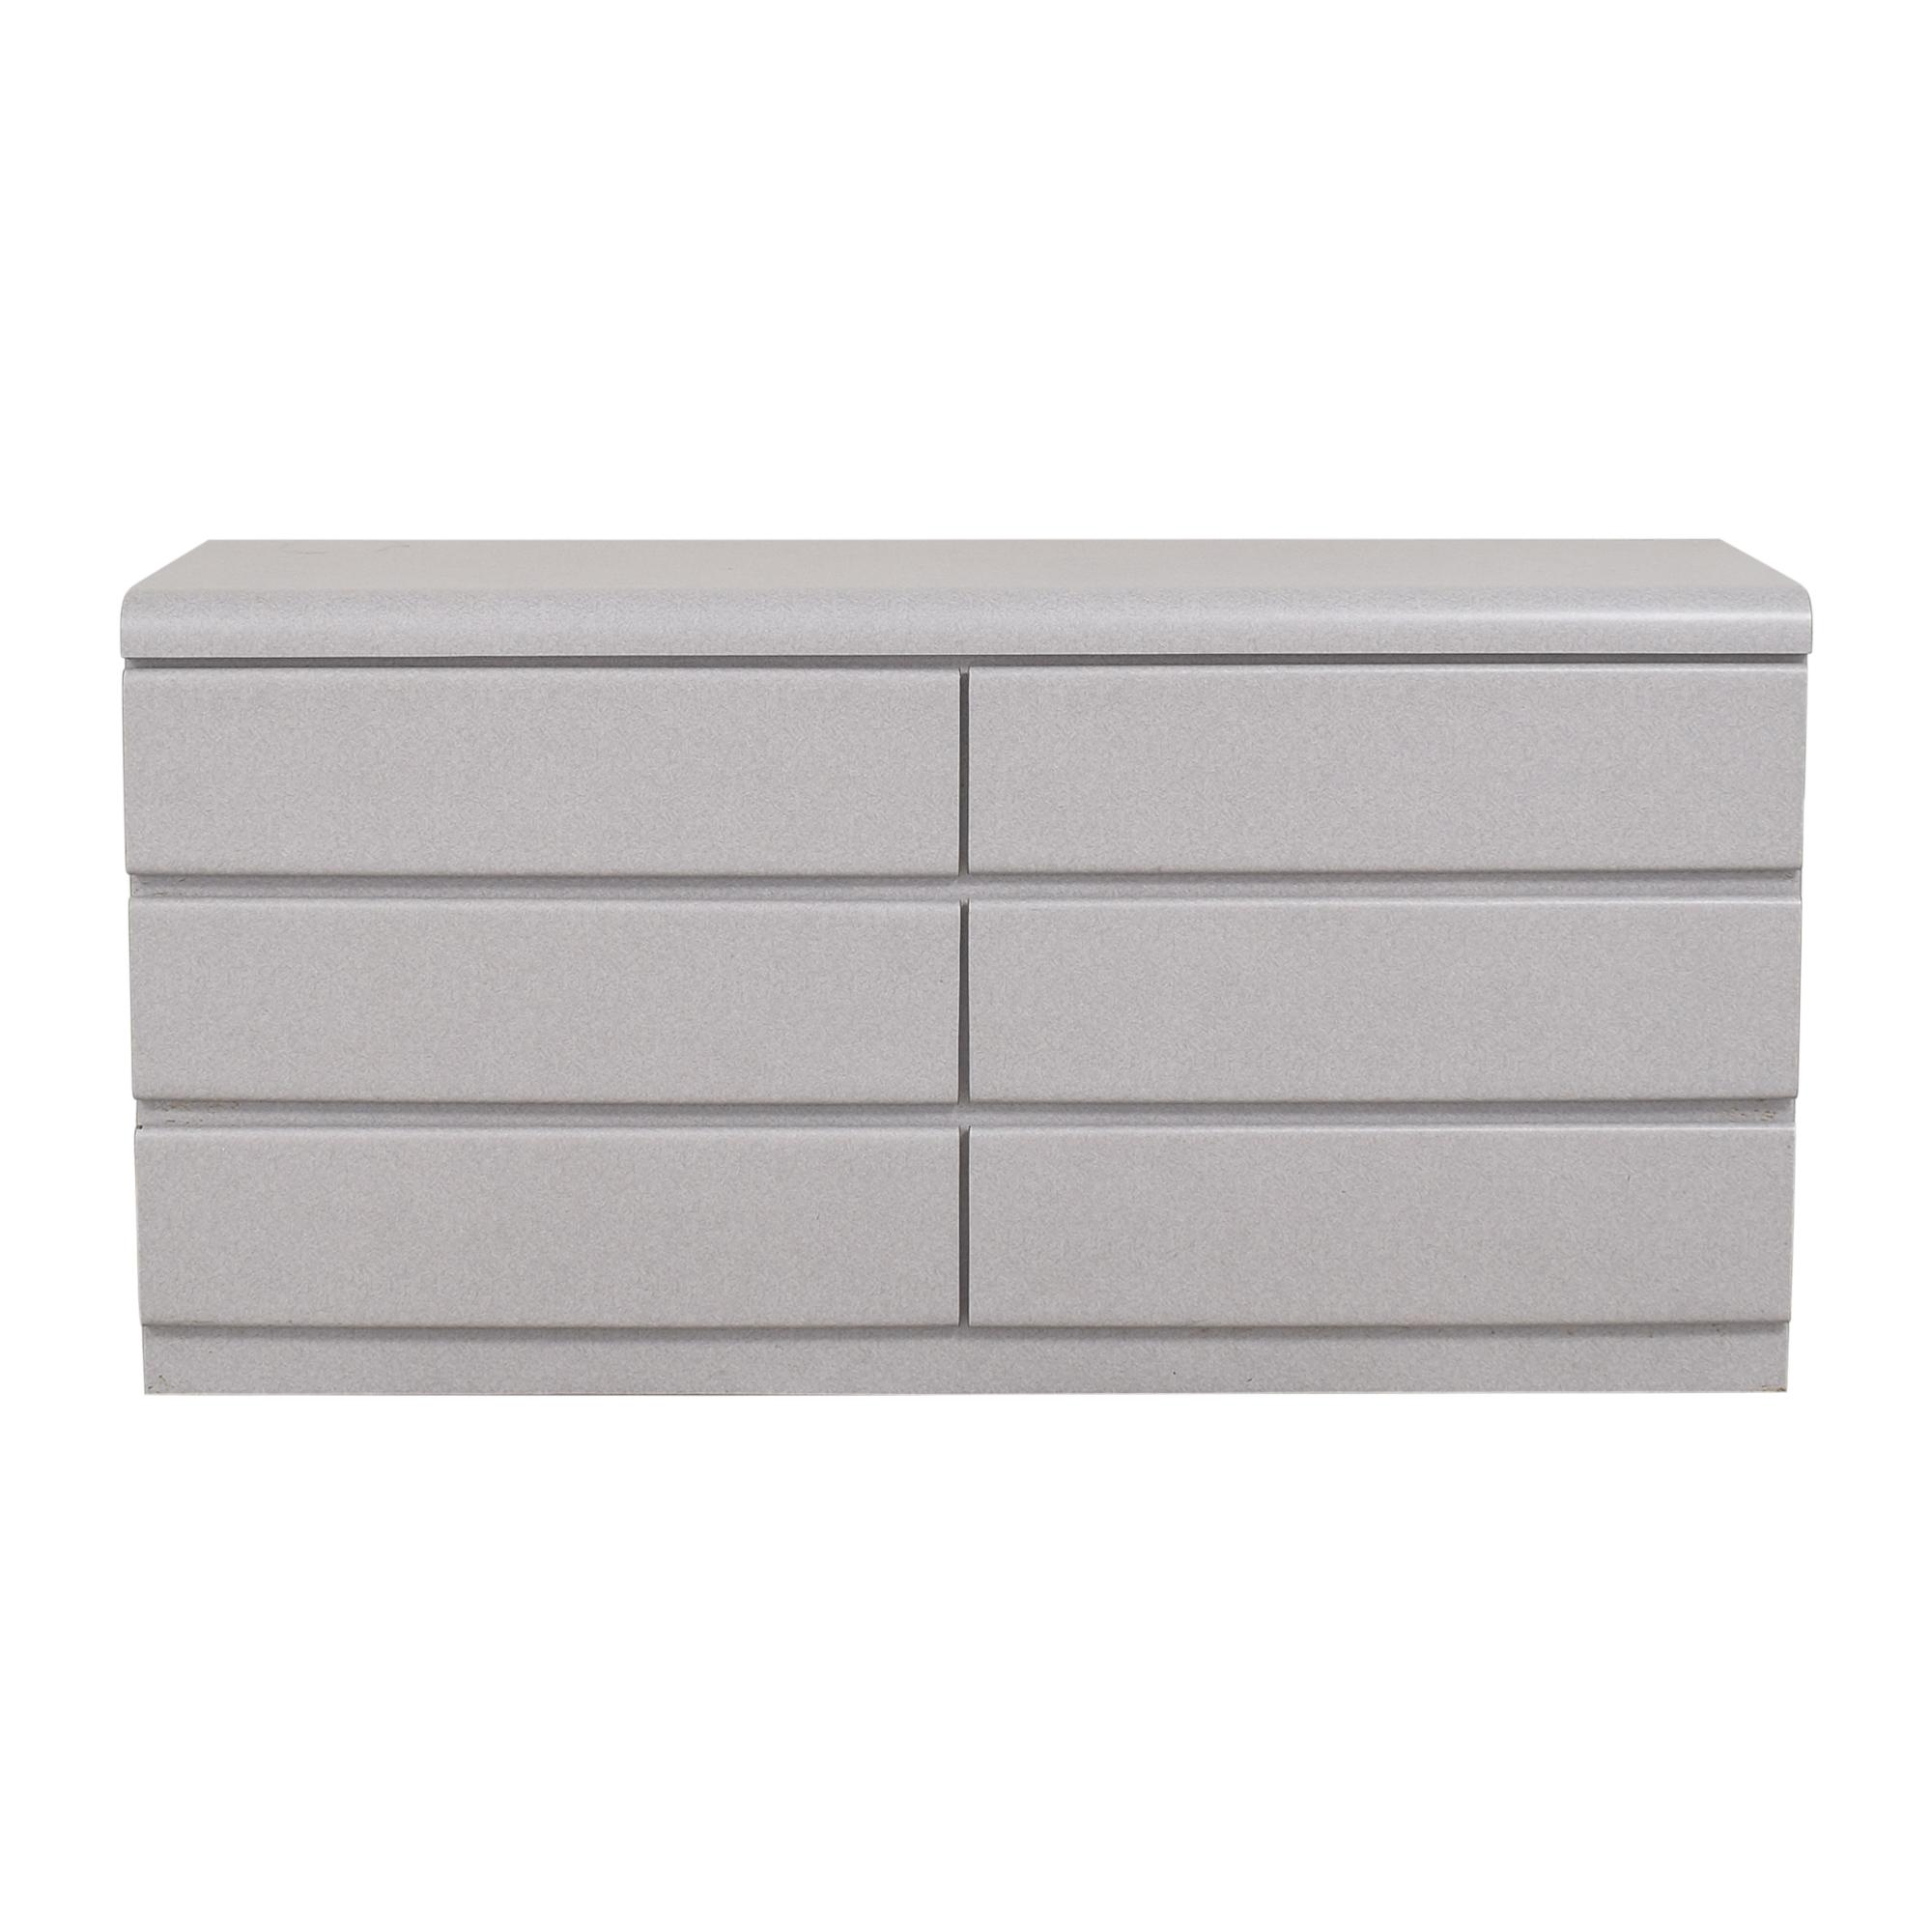 2xhome 2xhome Six Drawer Modern Dresser nyc